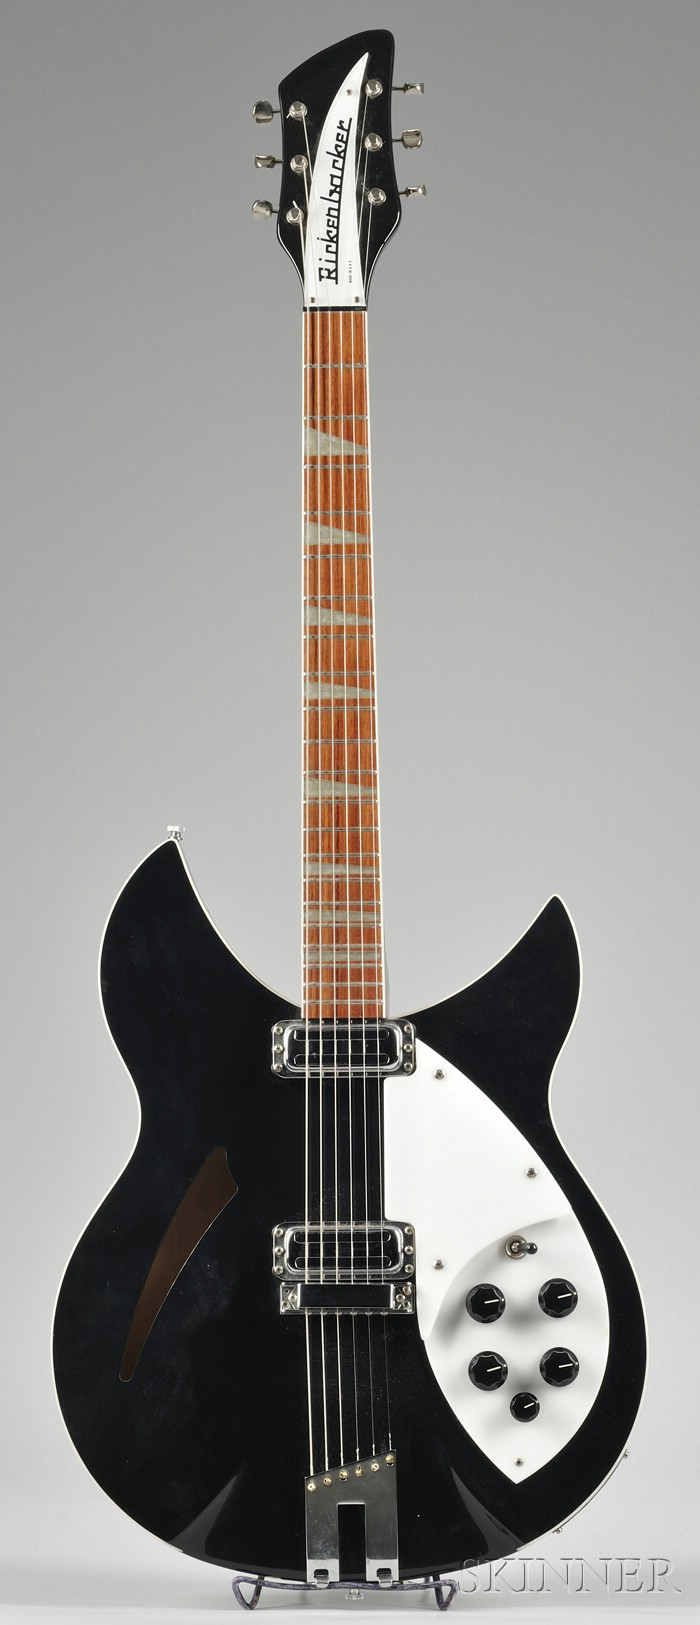 American Electric Guitar, Rickenbacker Company, Santa Ana, 1996, Model 360